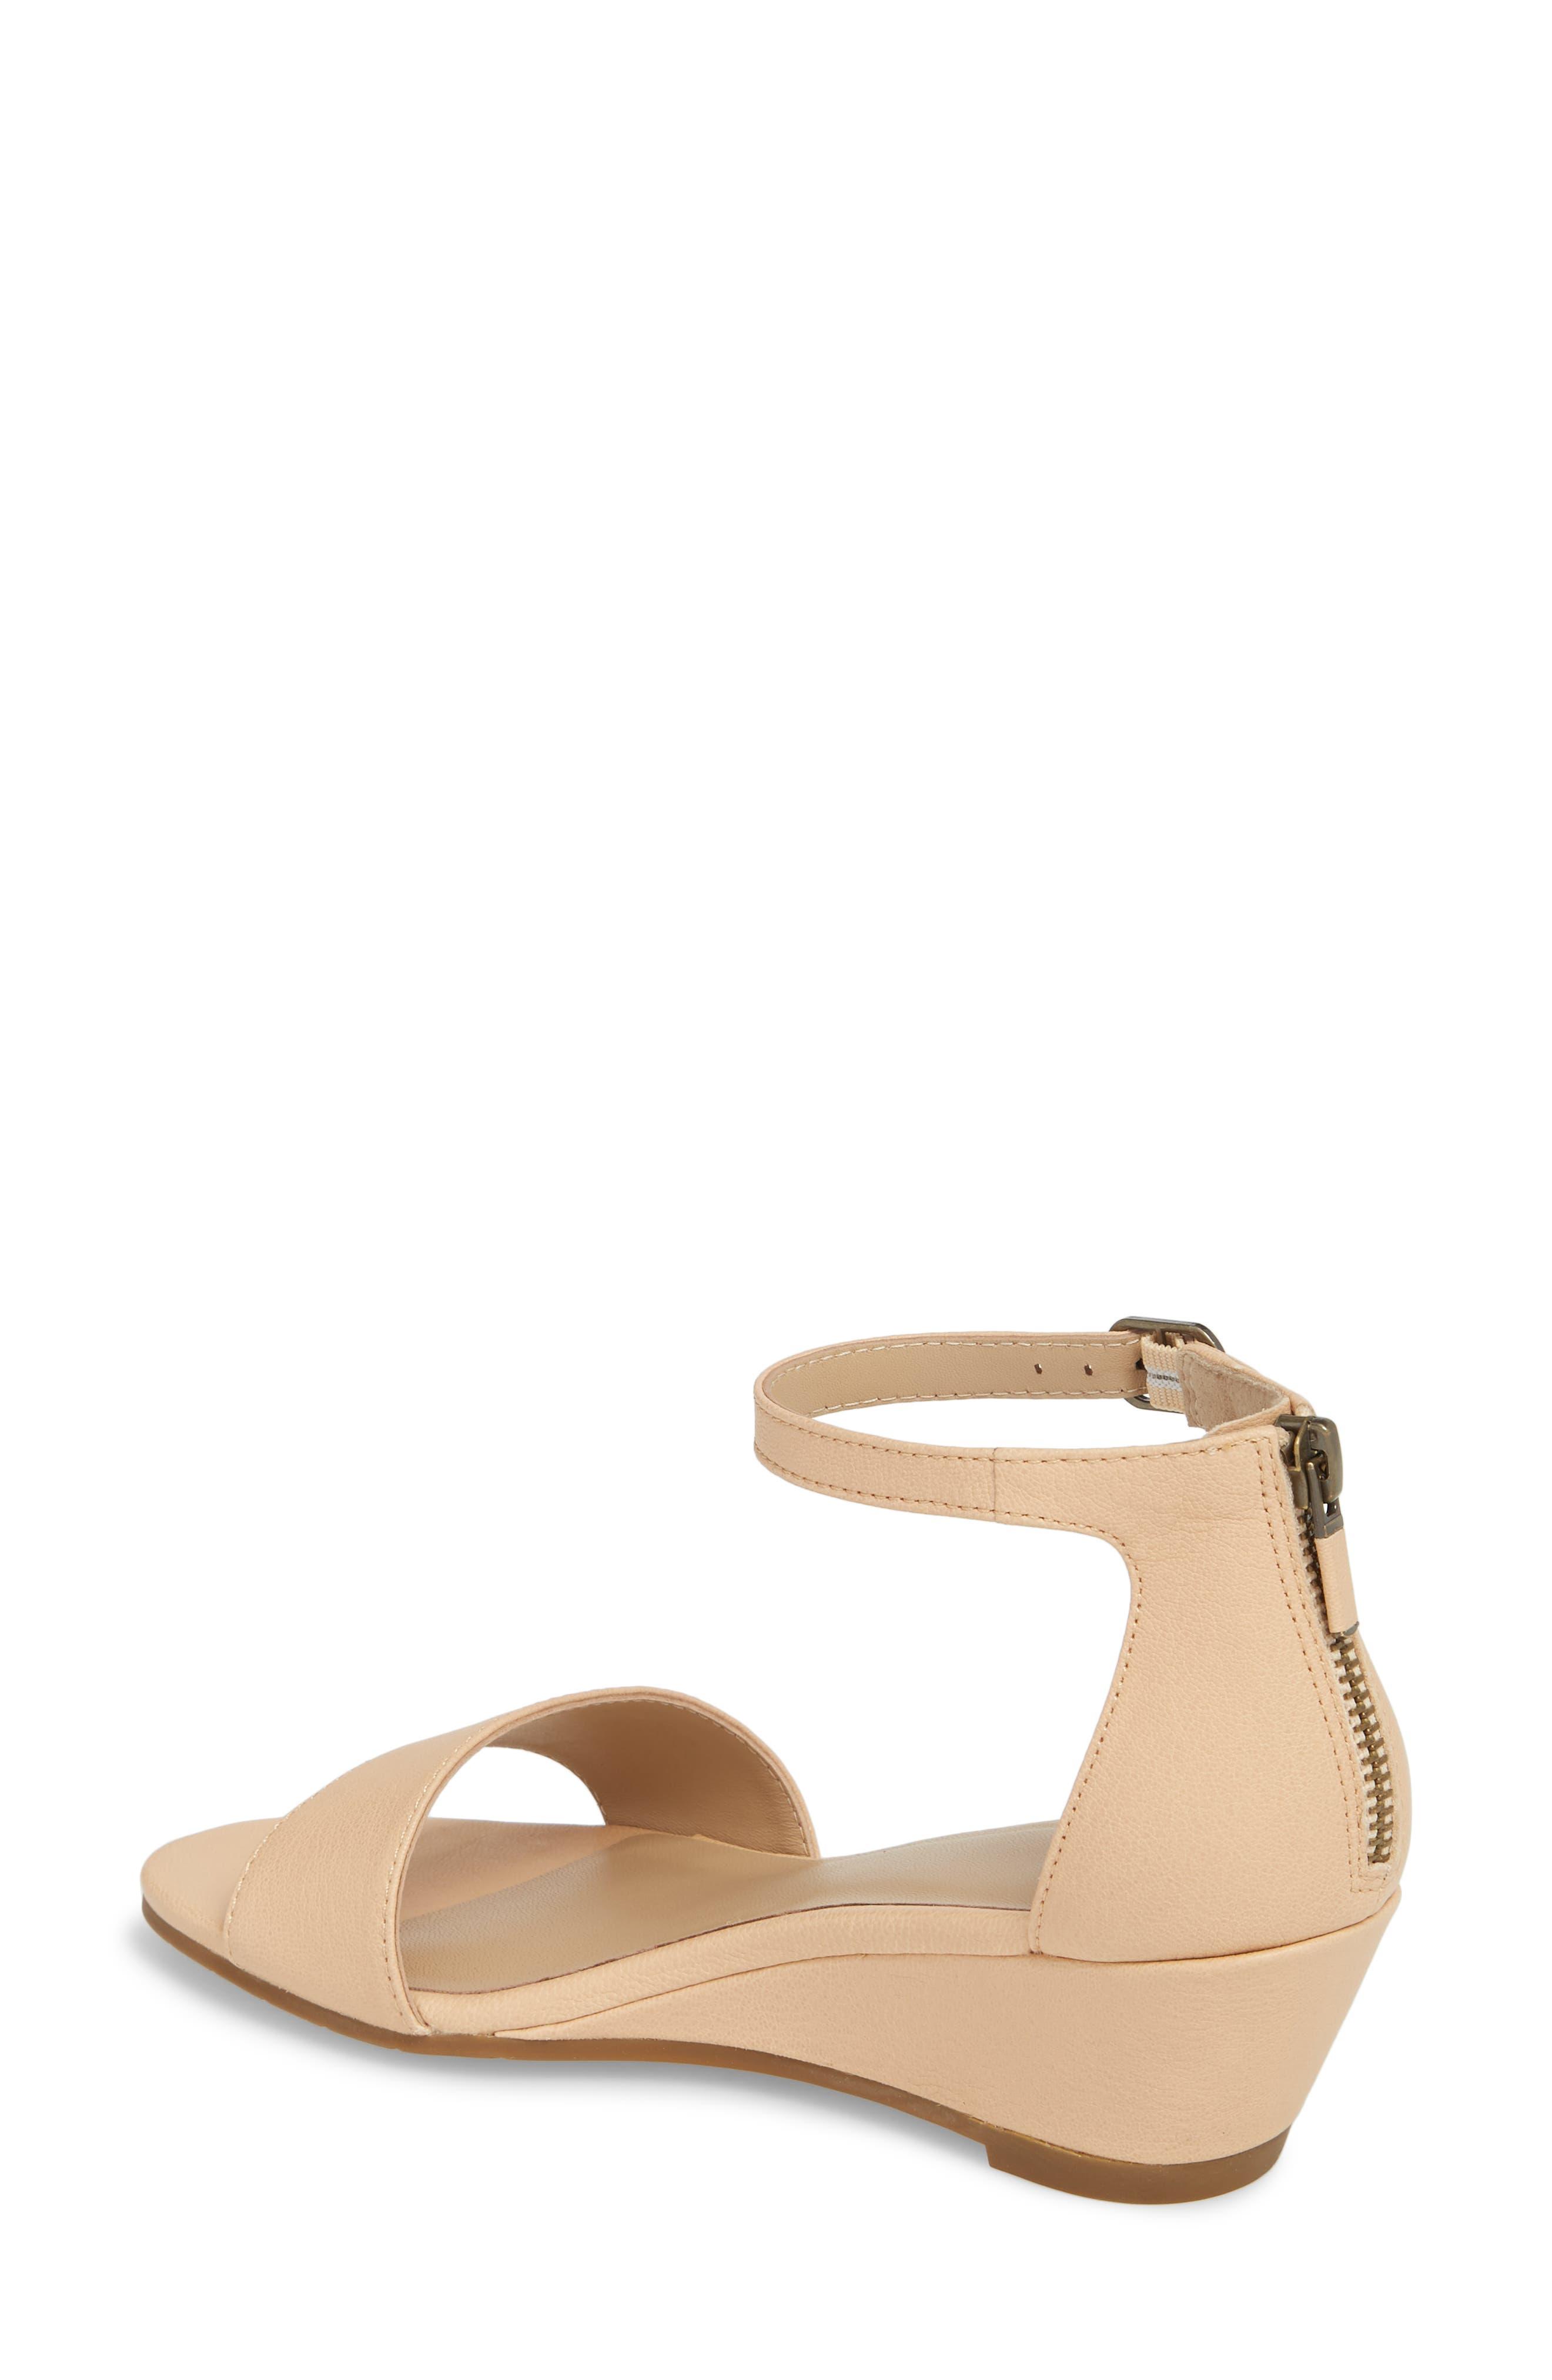 Mara Ankle Strap Wedge Sandal,                             Alternate thumbnail 6, color,